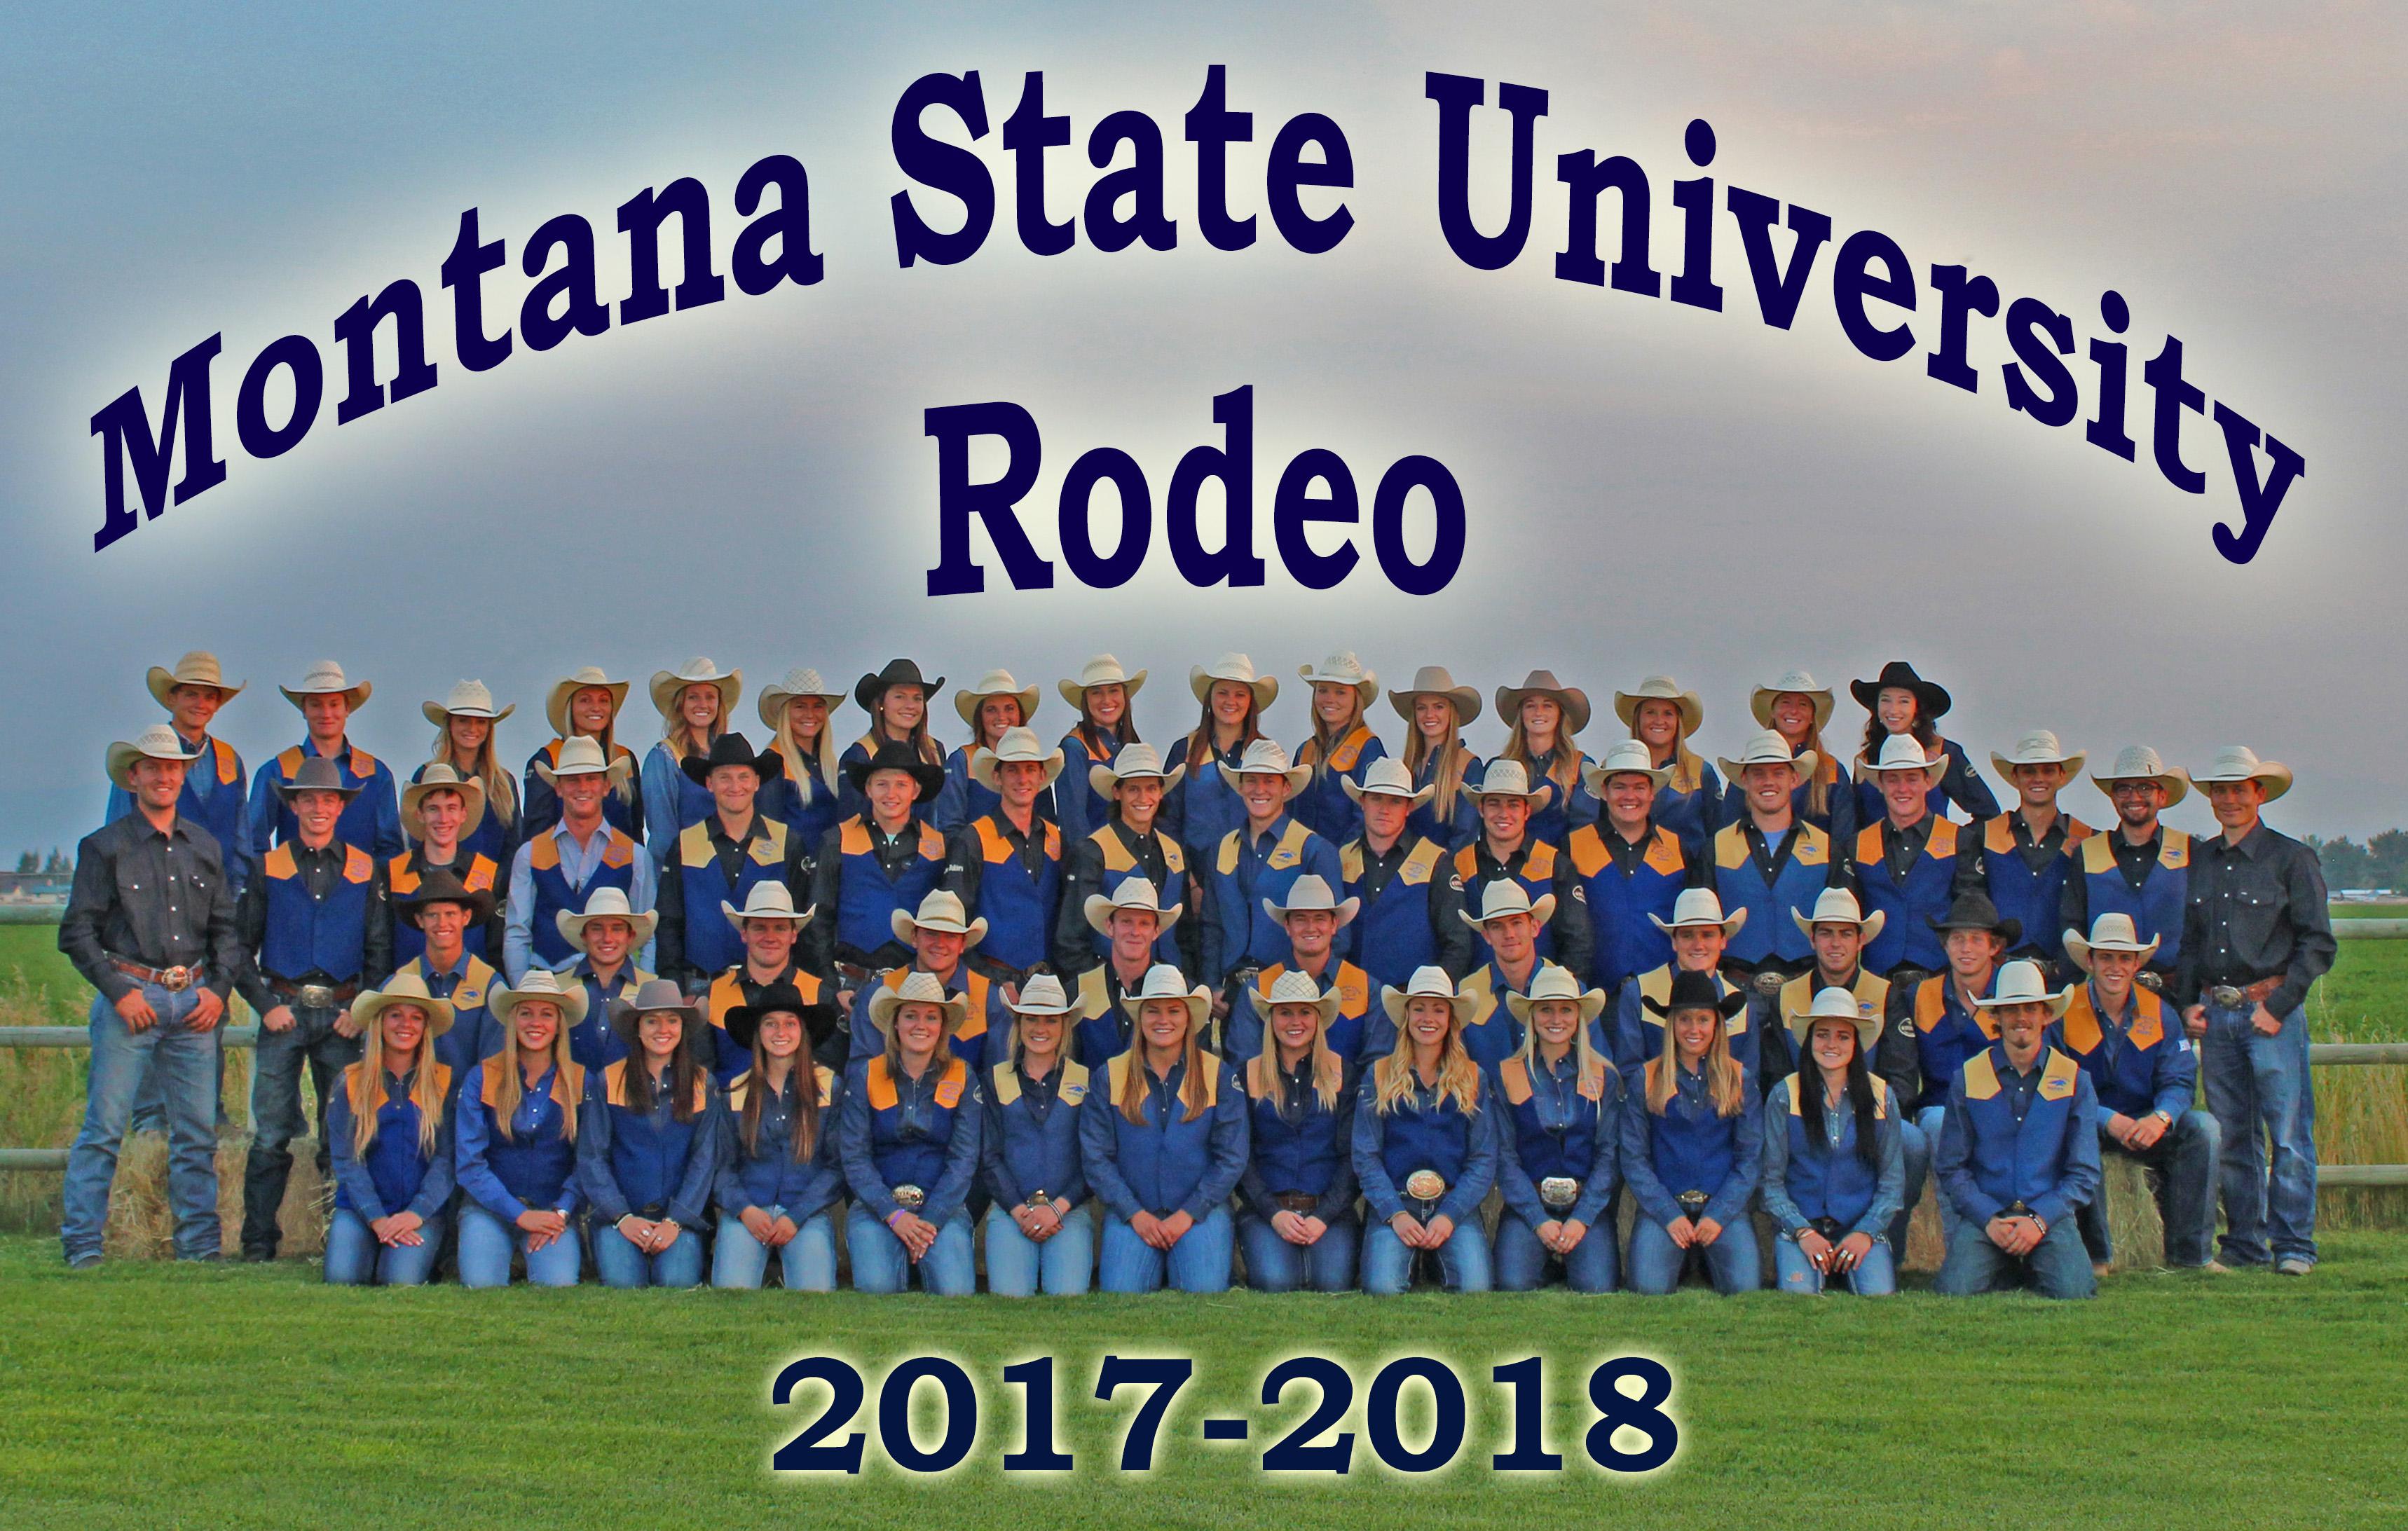 Bobcat Rodeo Team Bobcat Rodeo Office Montana State University